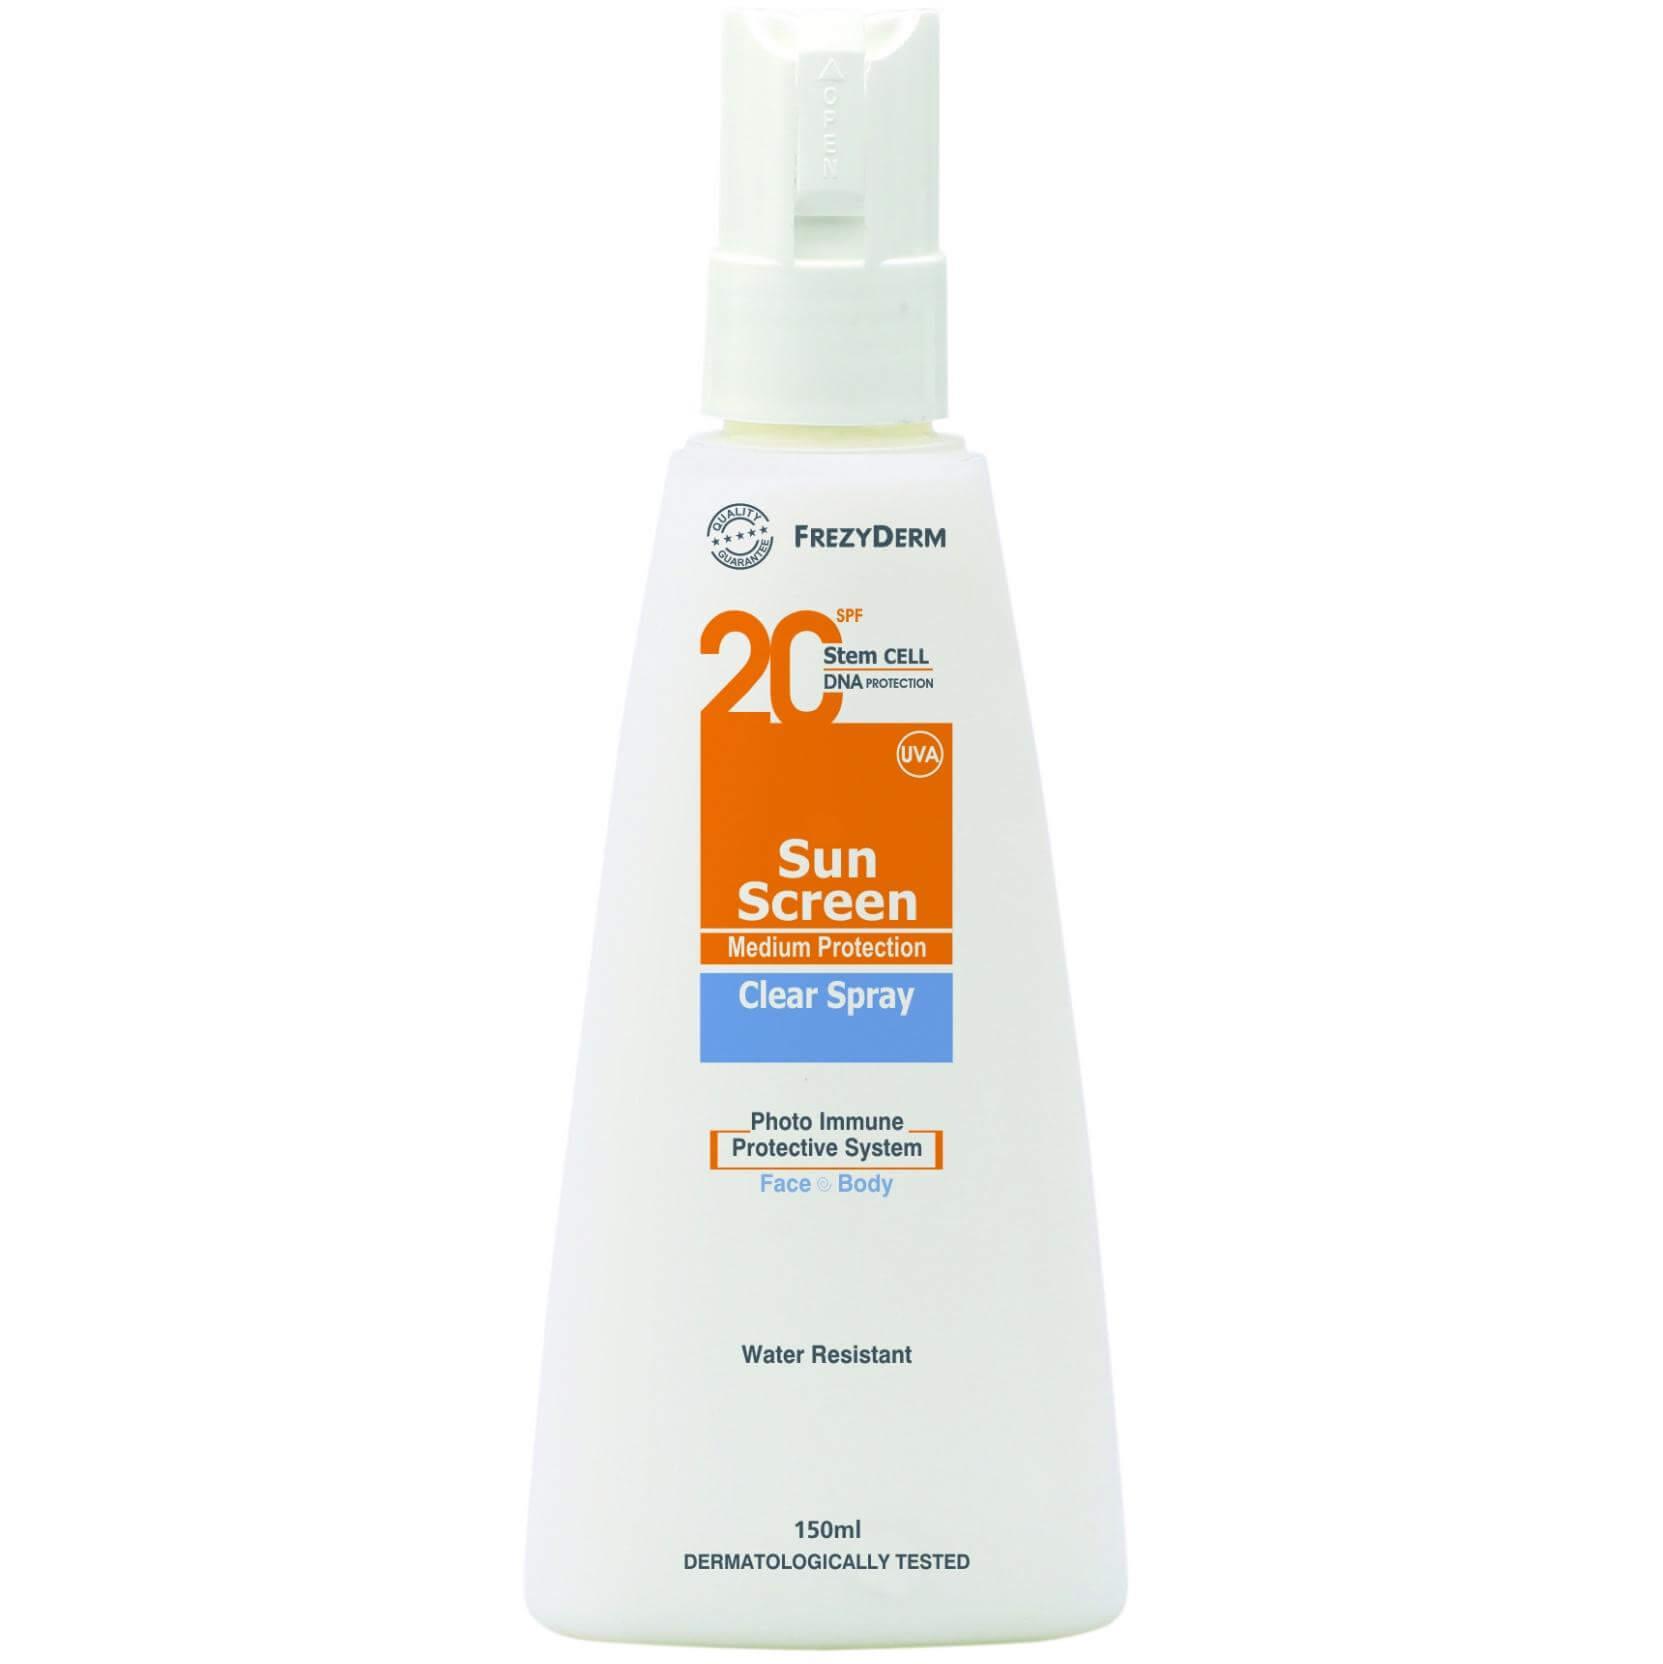 Frezyderm Sun Screen Clear Spray Spf20 Αντηλιακό Διάφανο Λάδι Προσώπου – Σώματος Μεσαίας Προστασίας, μη Λιπαρής Υφής 150ml